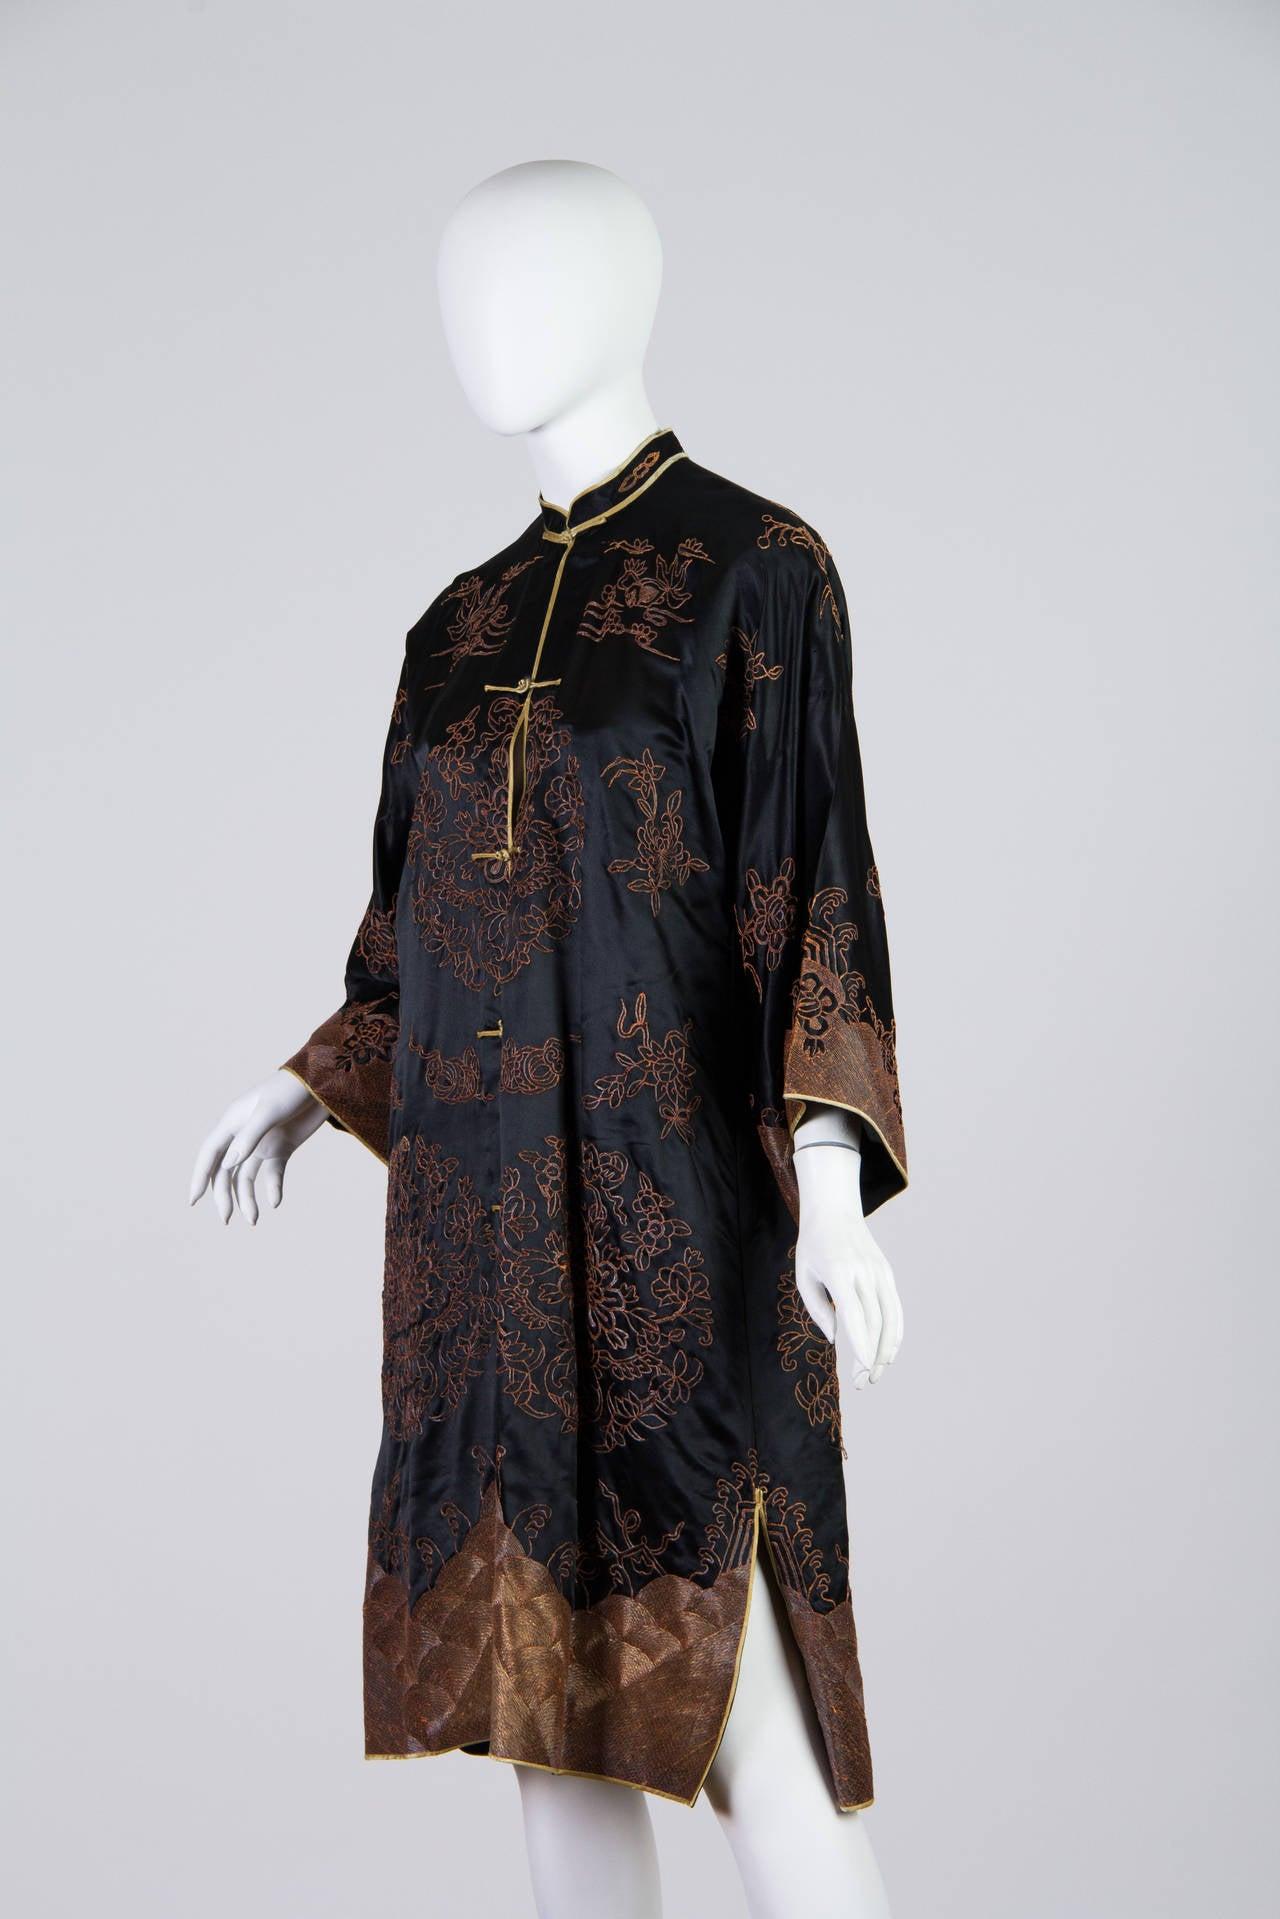 Early Chinese Embroidered Jacket Kimono style 3